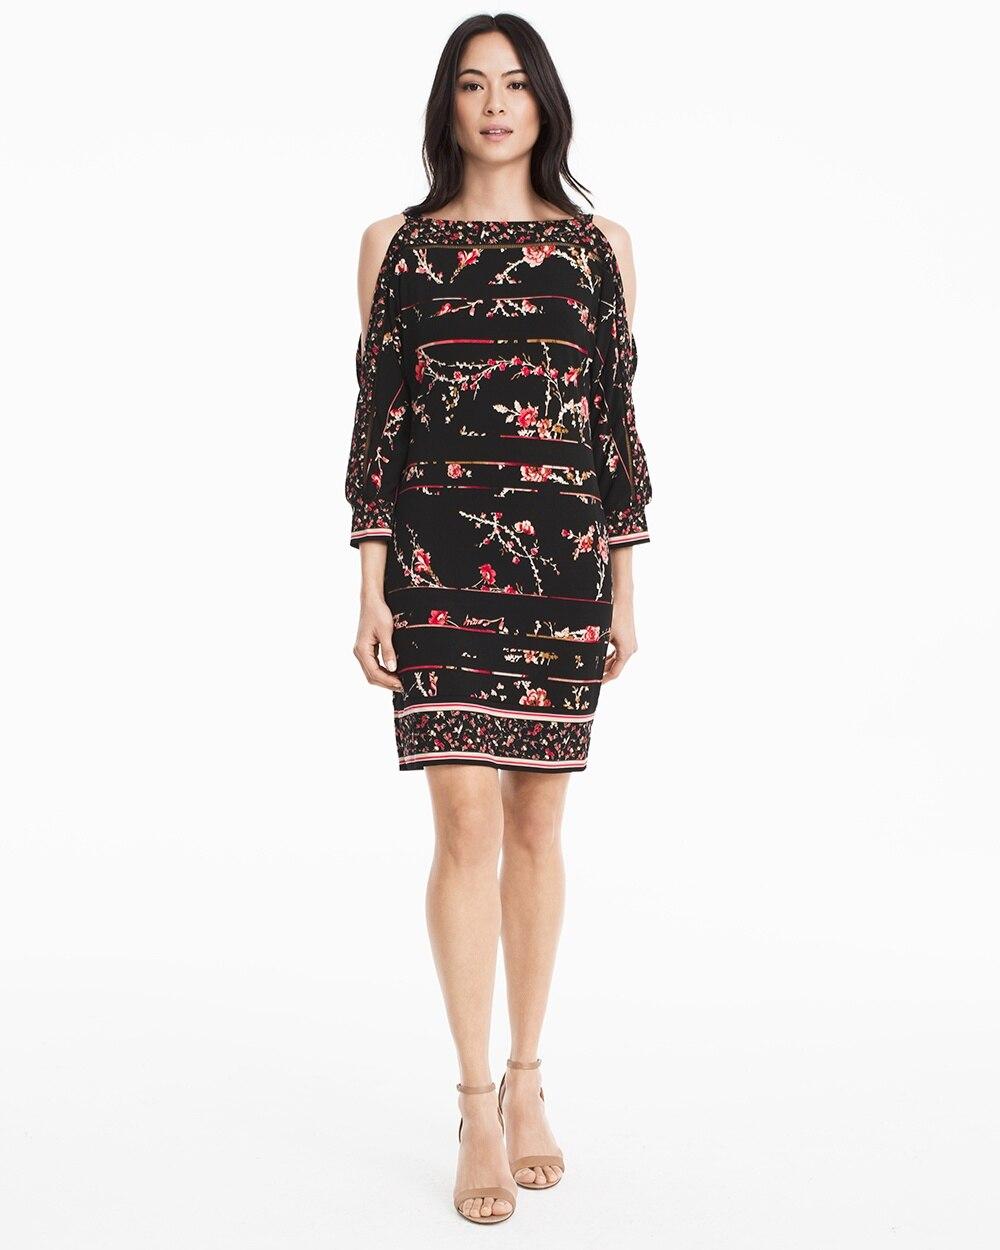 2085ee4b338 Split Sleeve Floral Print Knit Shift Dress - White House Black Market